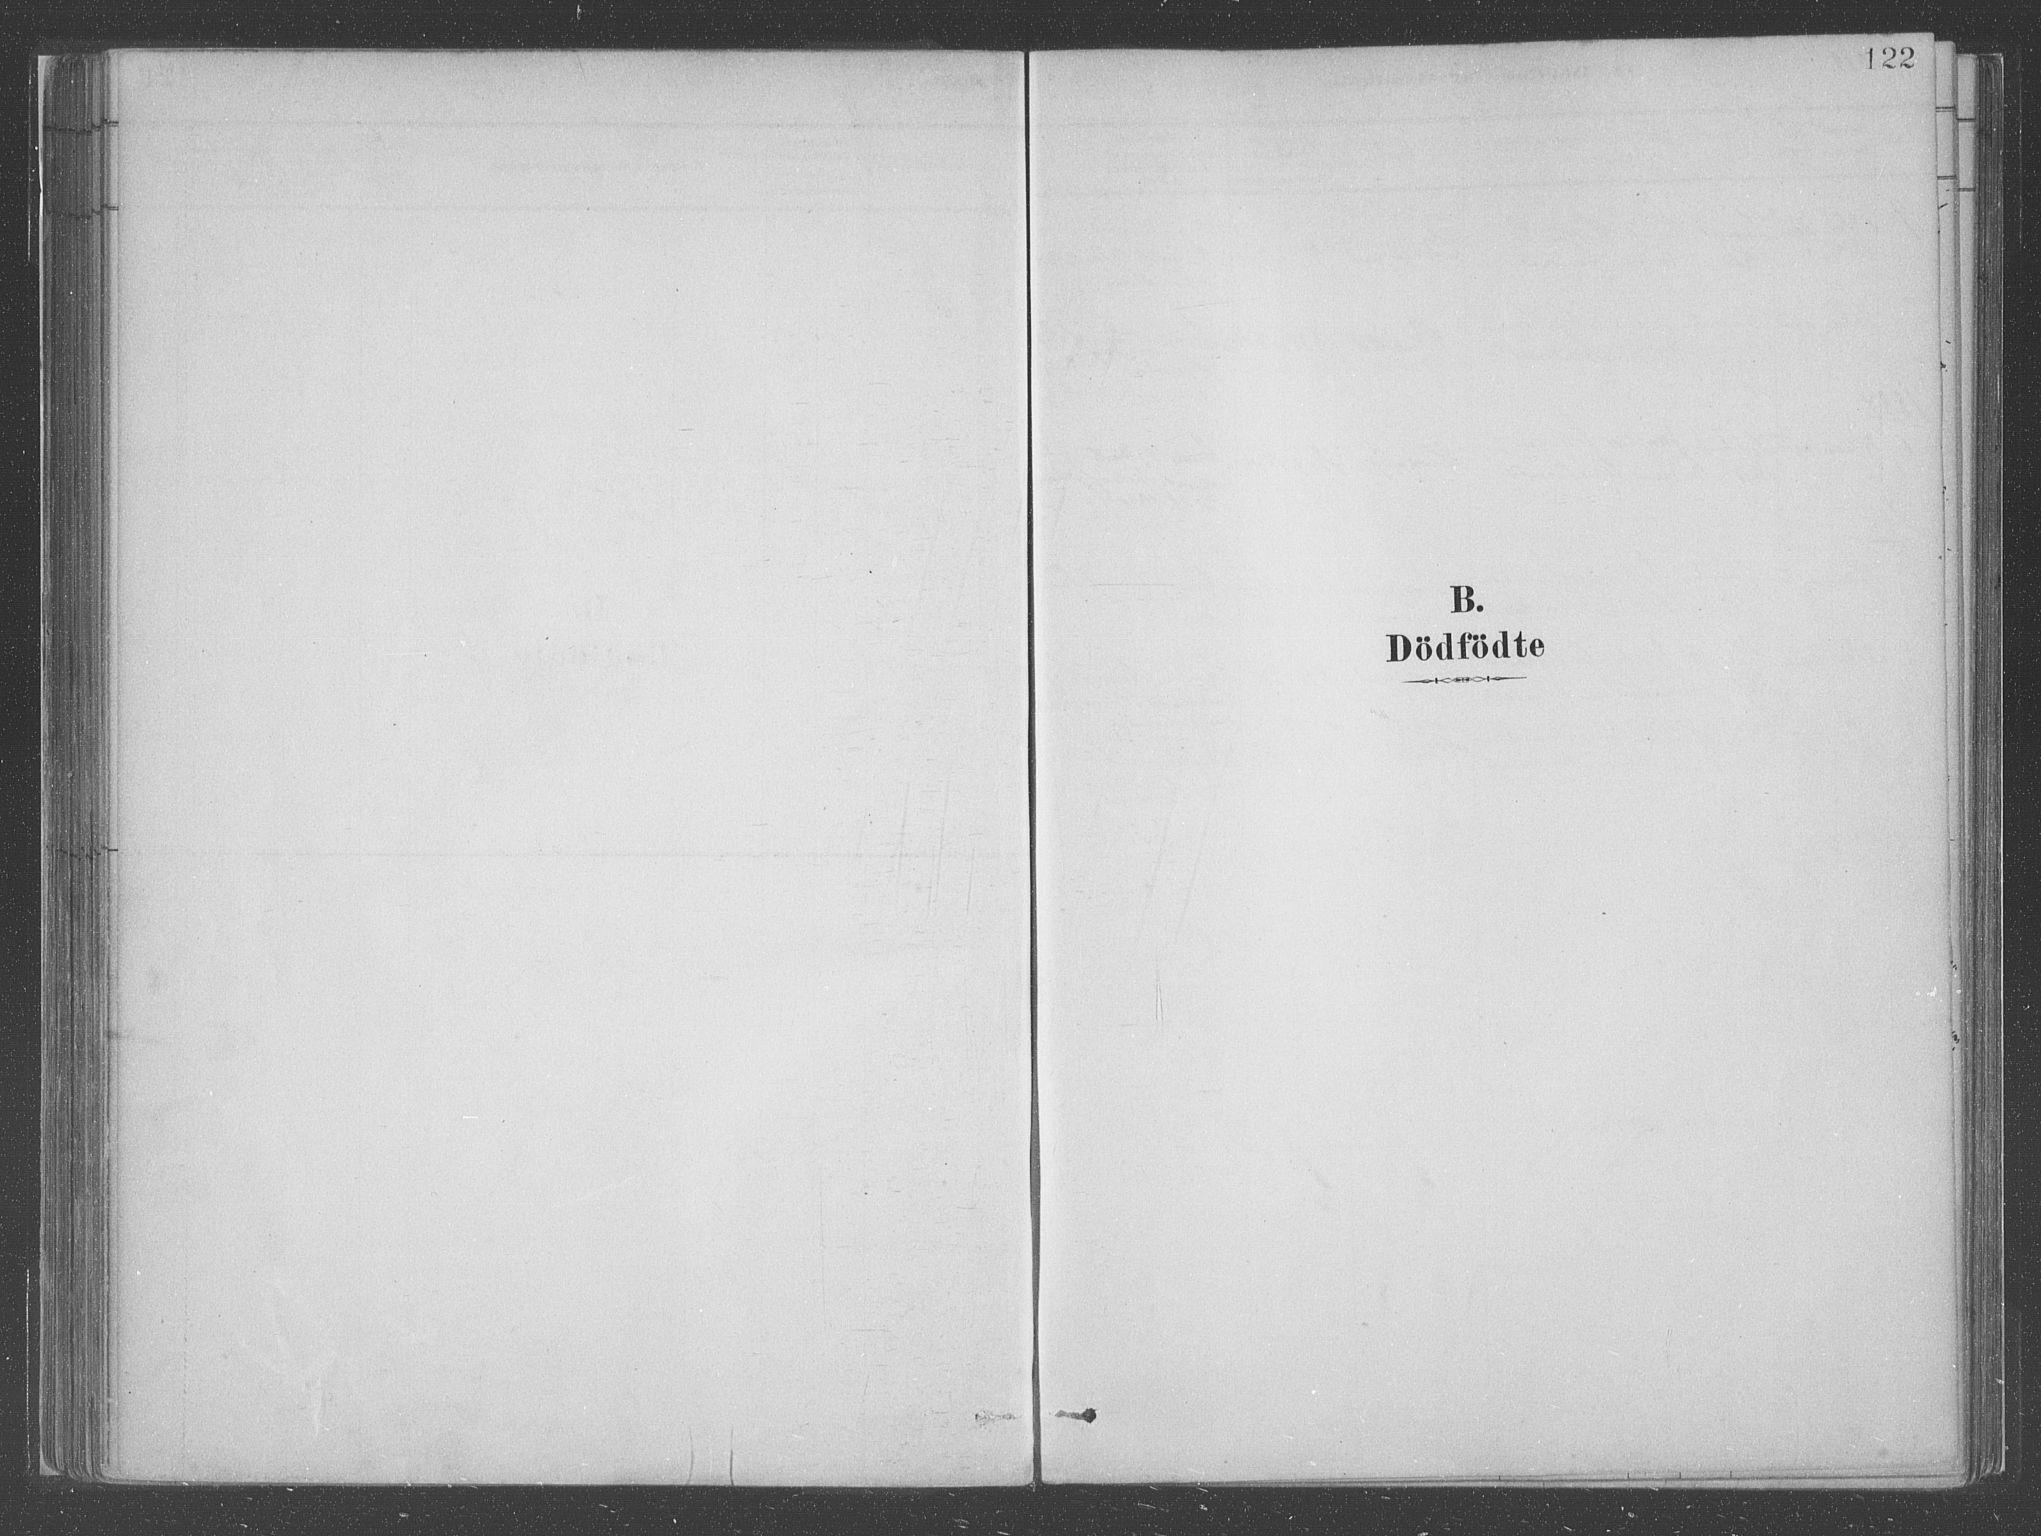 SAB, Askvoll sokneprestembete, H/Haa/Haac/L0001: Ministerialbok nr. C  1, 1879-1922, s. 122